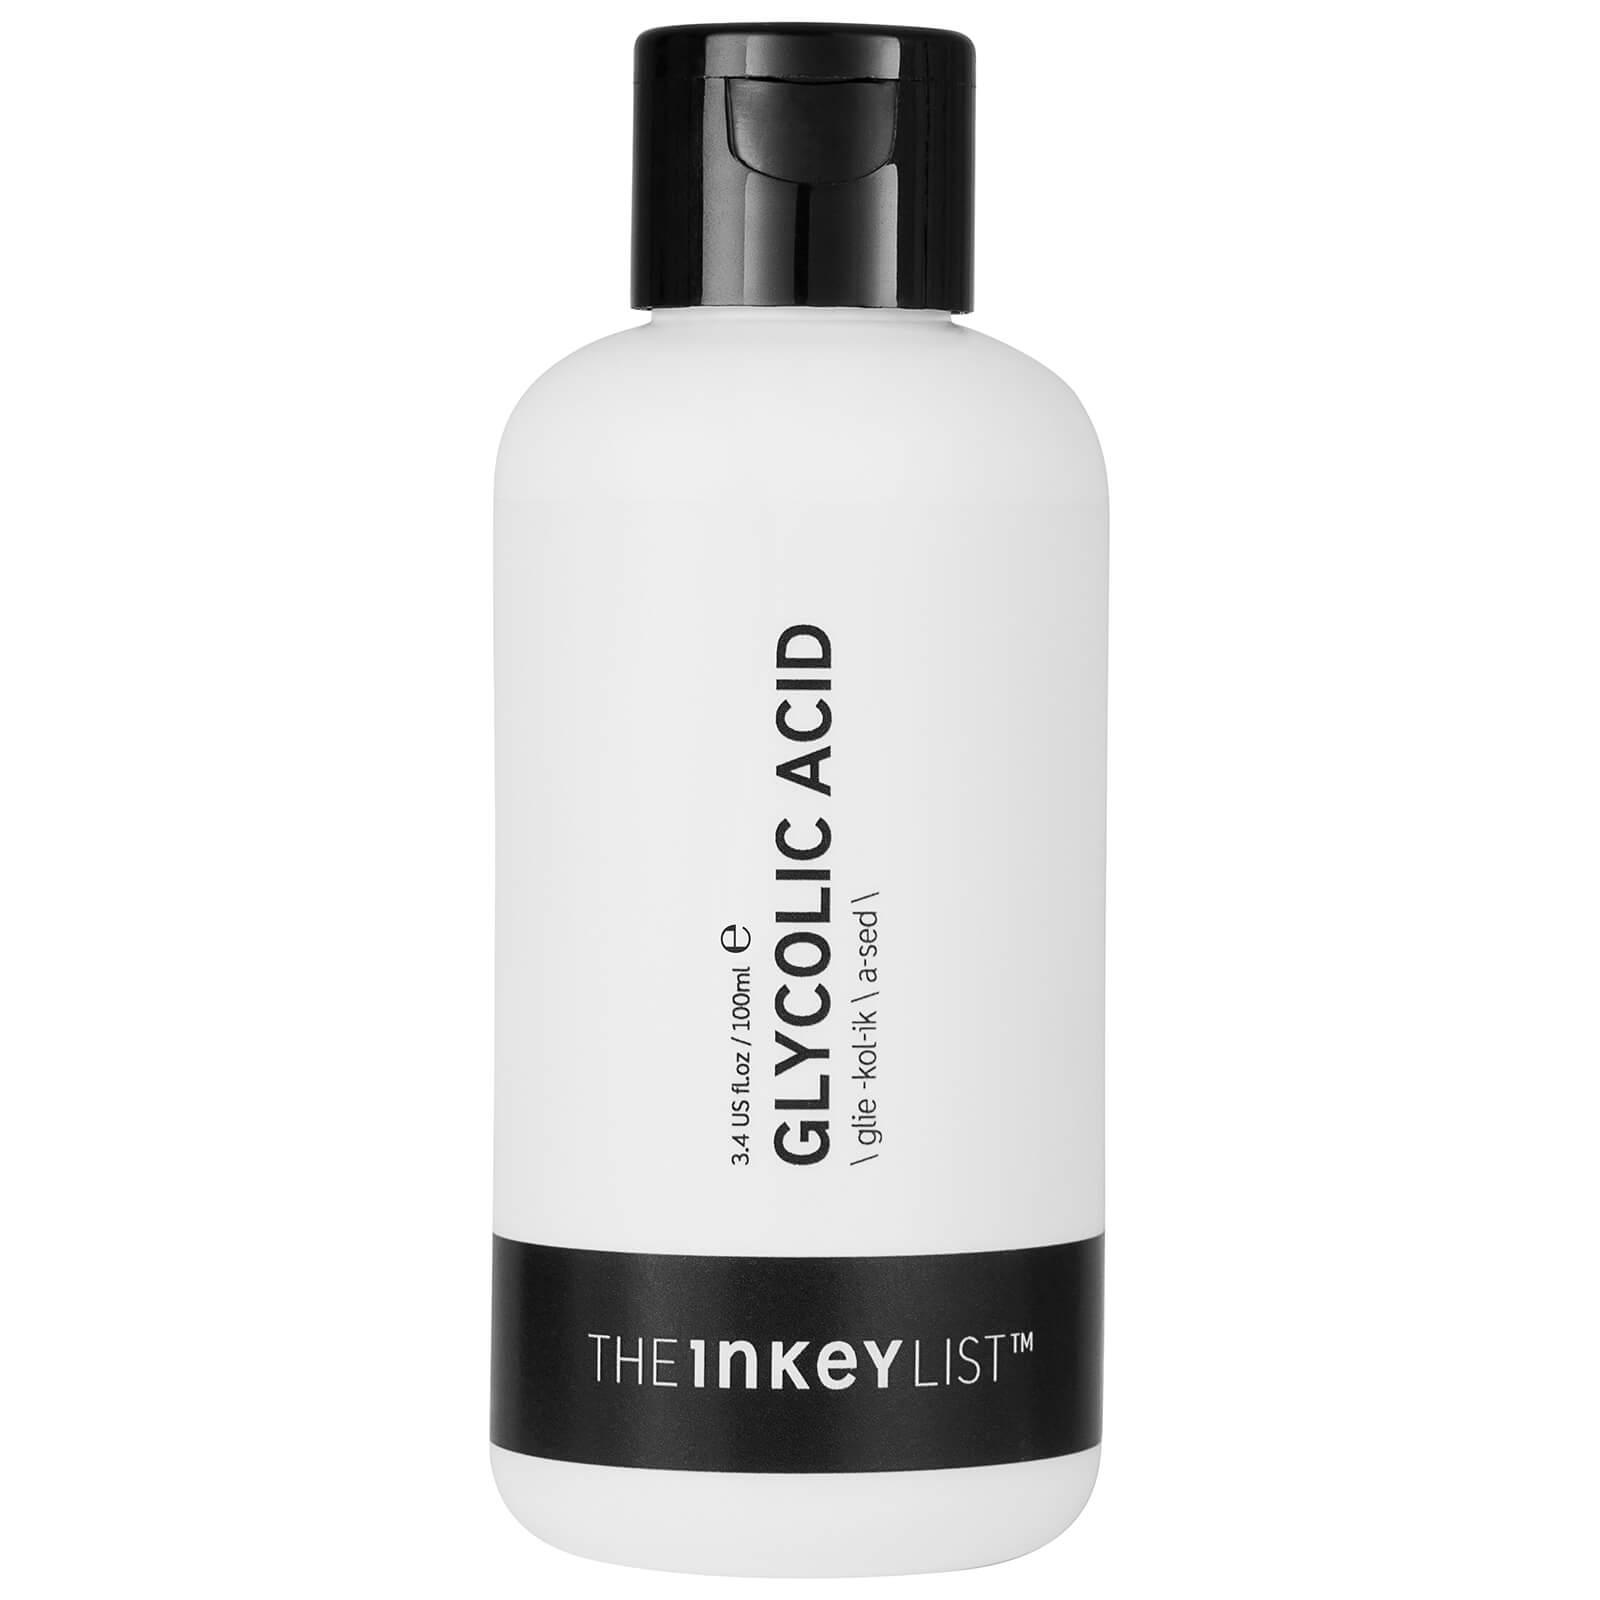 Купить The INKEY List Glycolic Acid Toner 100ml